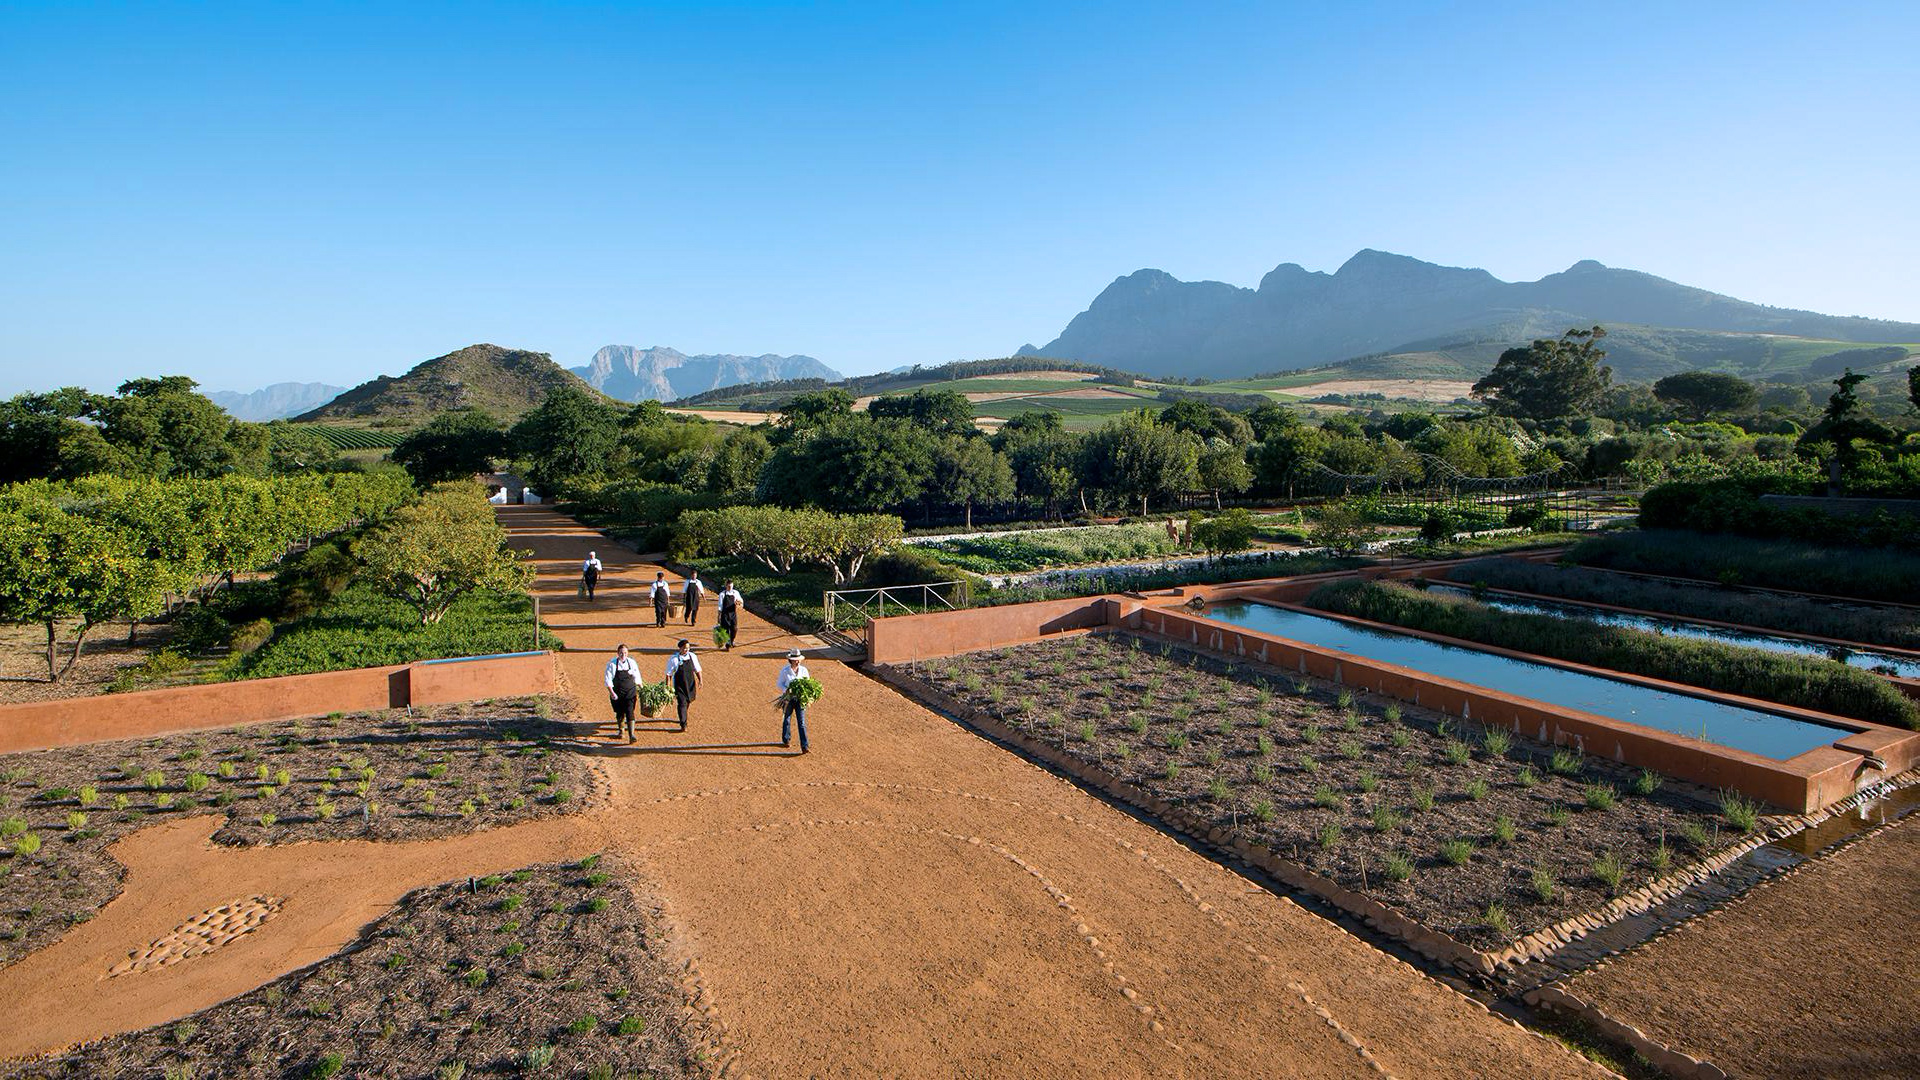 Lightyear One journeys at Babylonstoren, Franschhoek, in South Africa